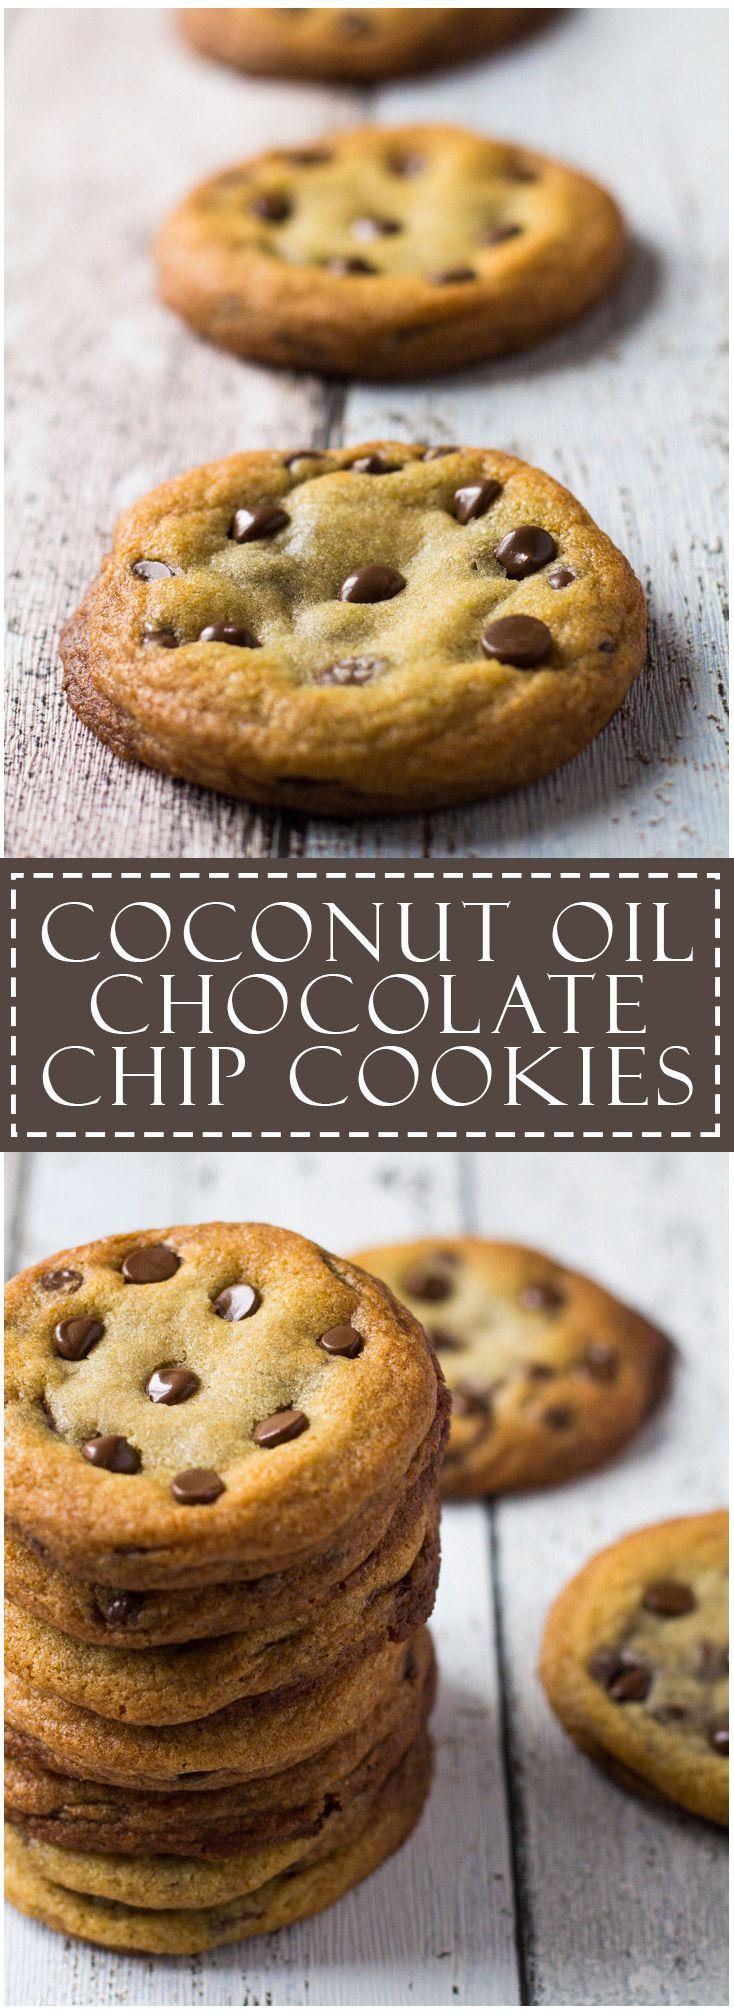 Coconut Oil Chocolate Chip Cookies | Marsha's Baking Addiction